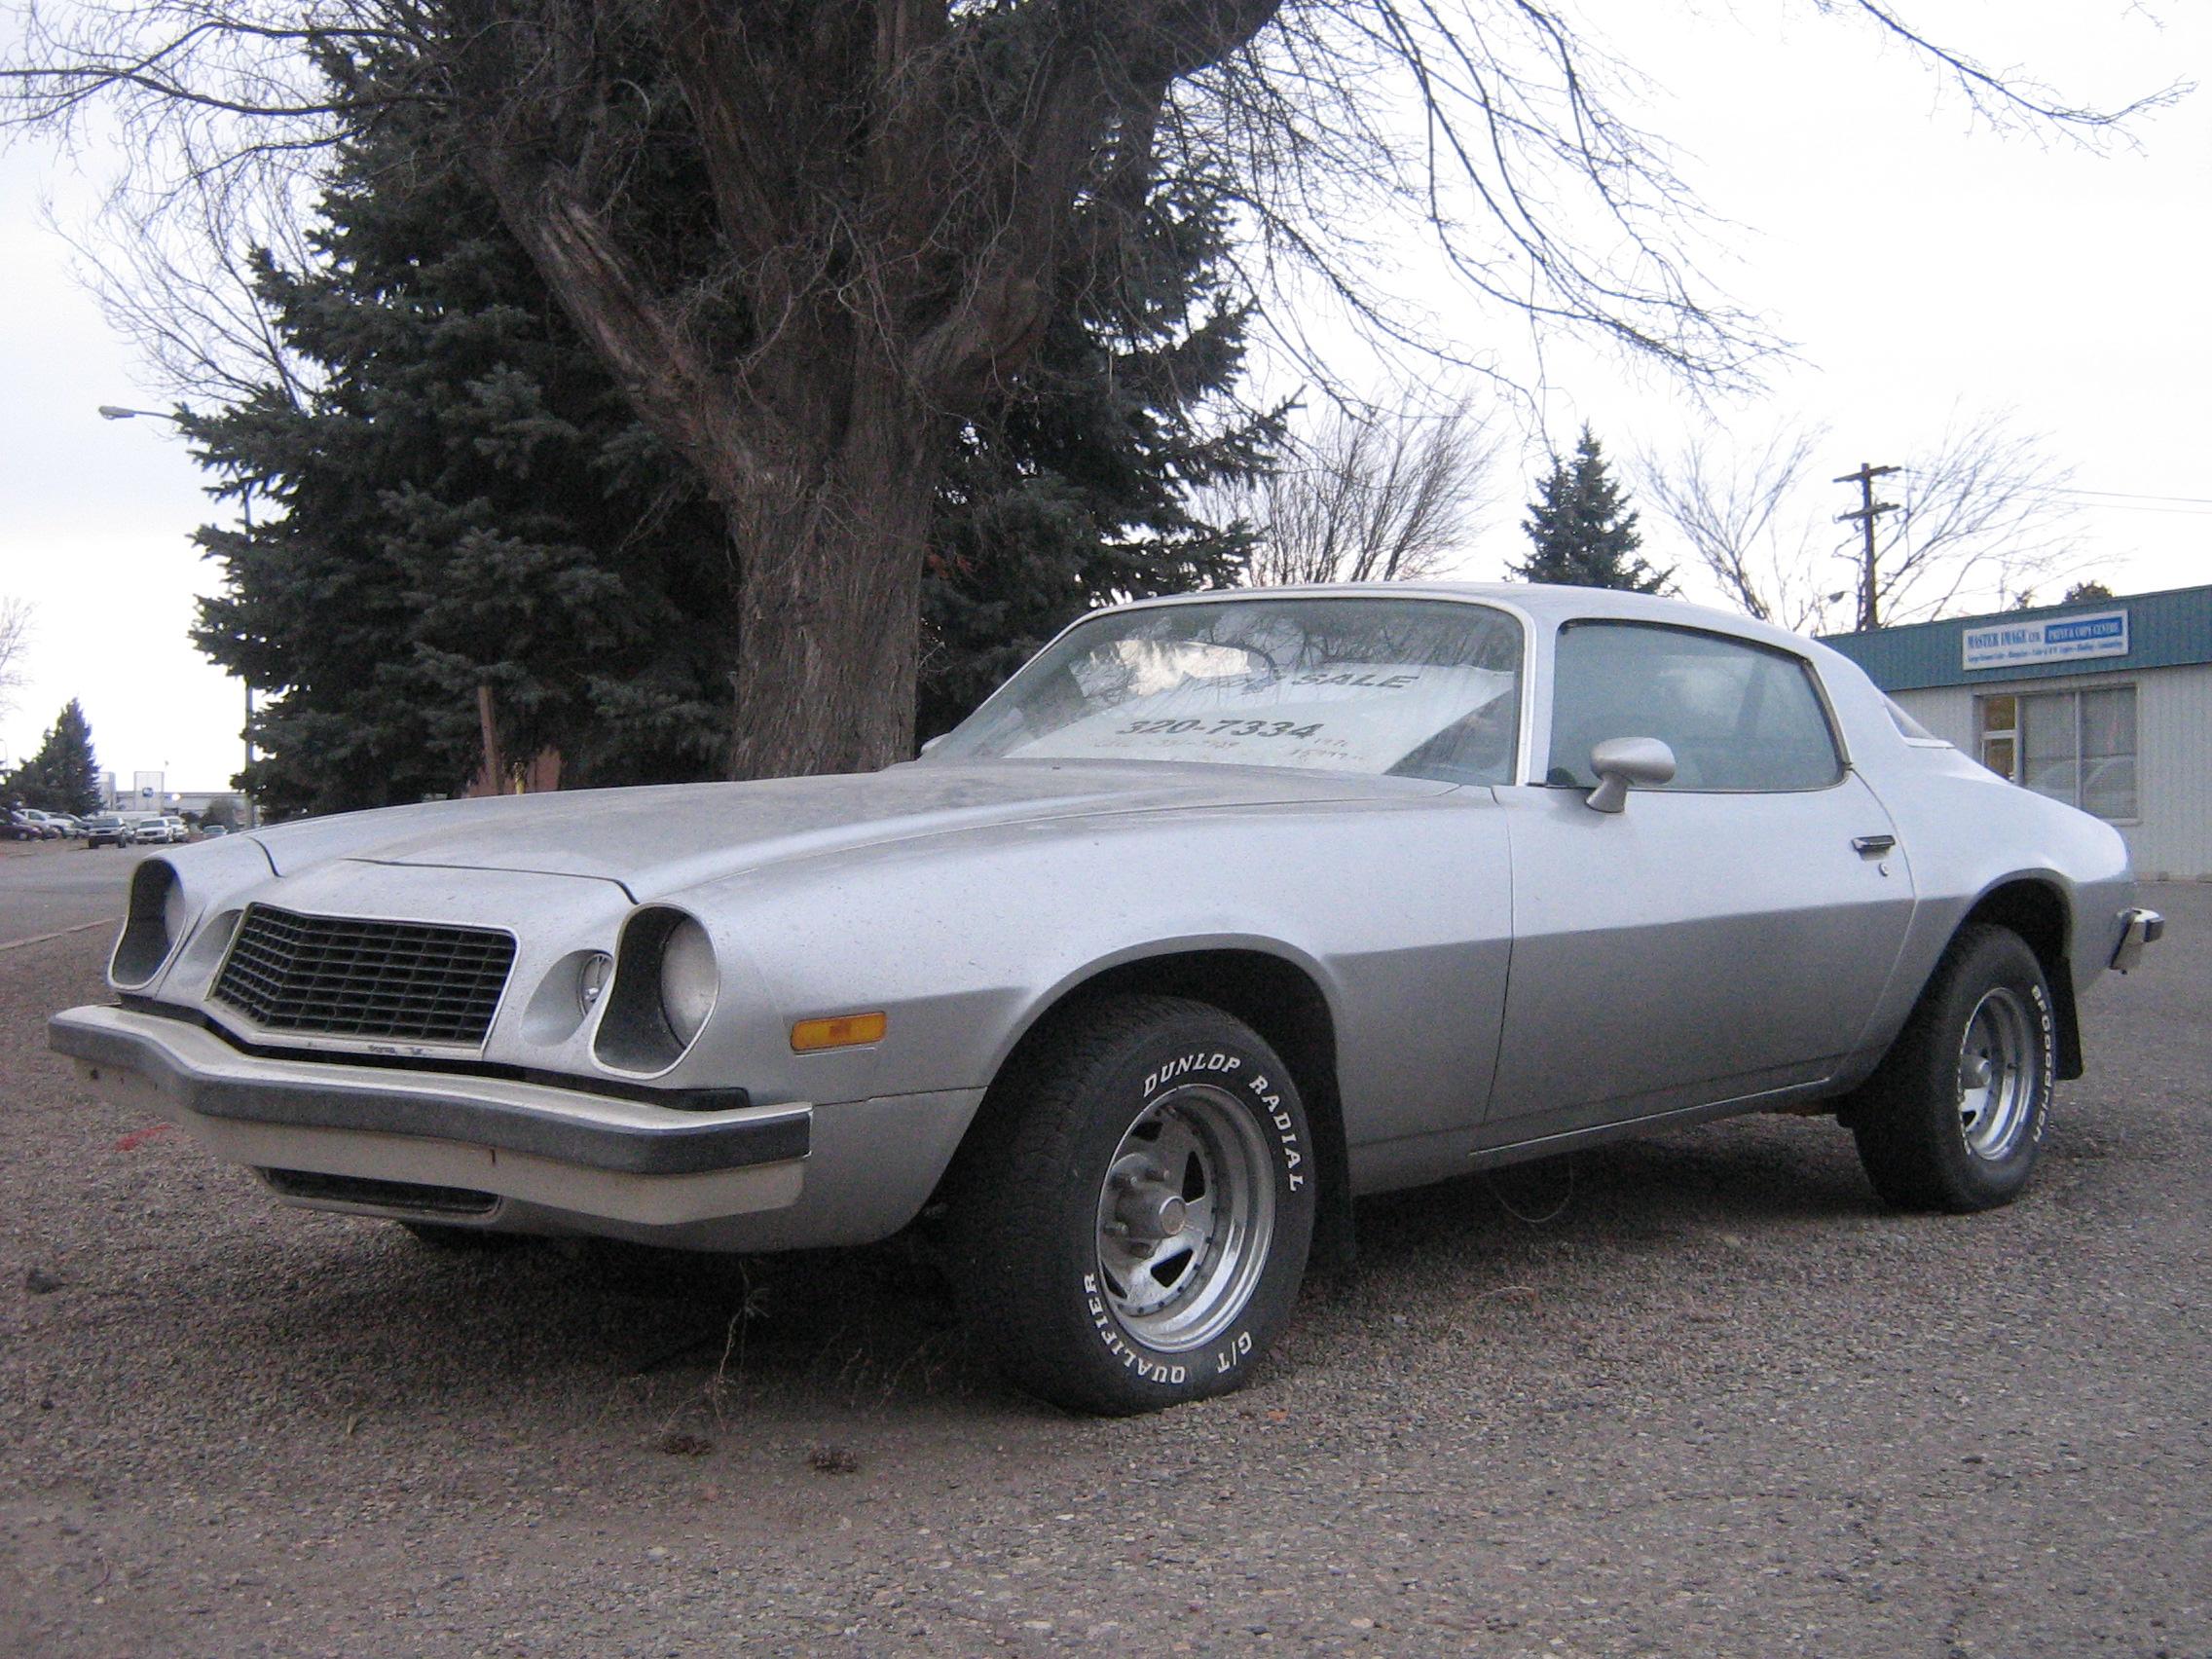 File:1976 Chevrolet Camaro (3105801142) jpg - Wikimedia Commons